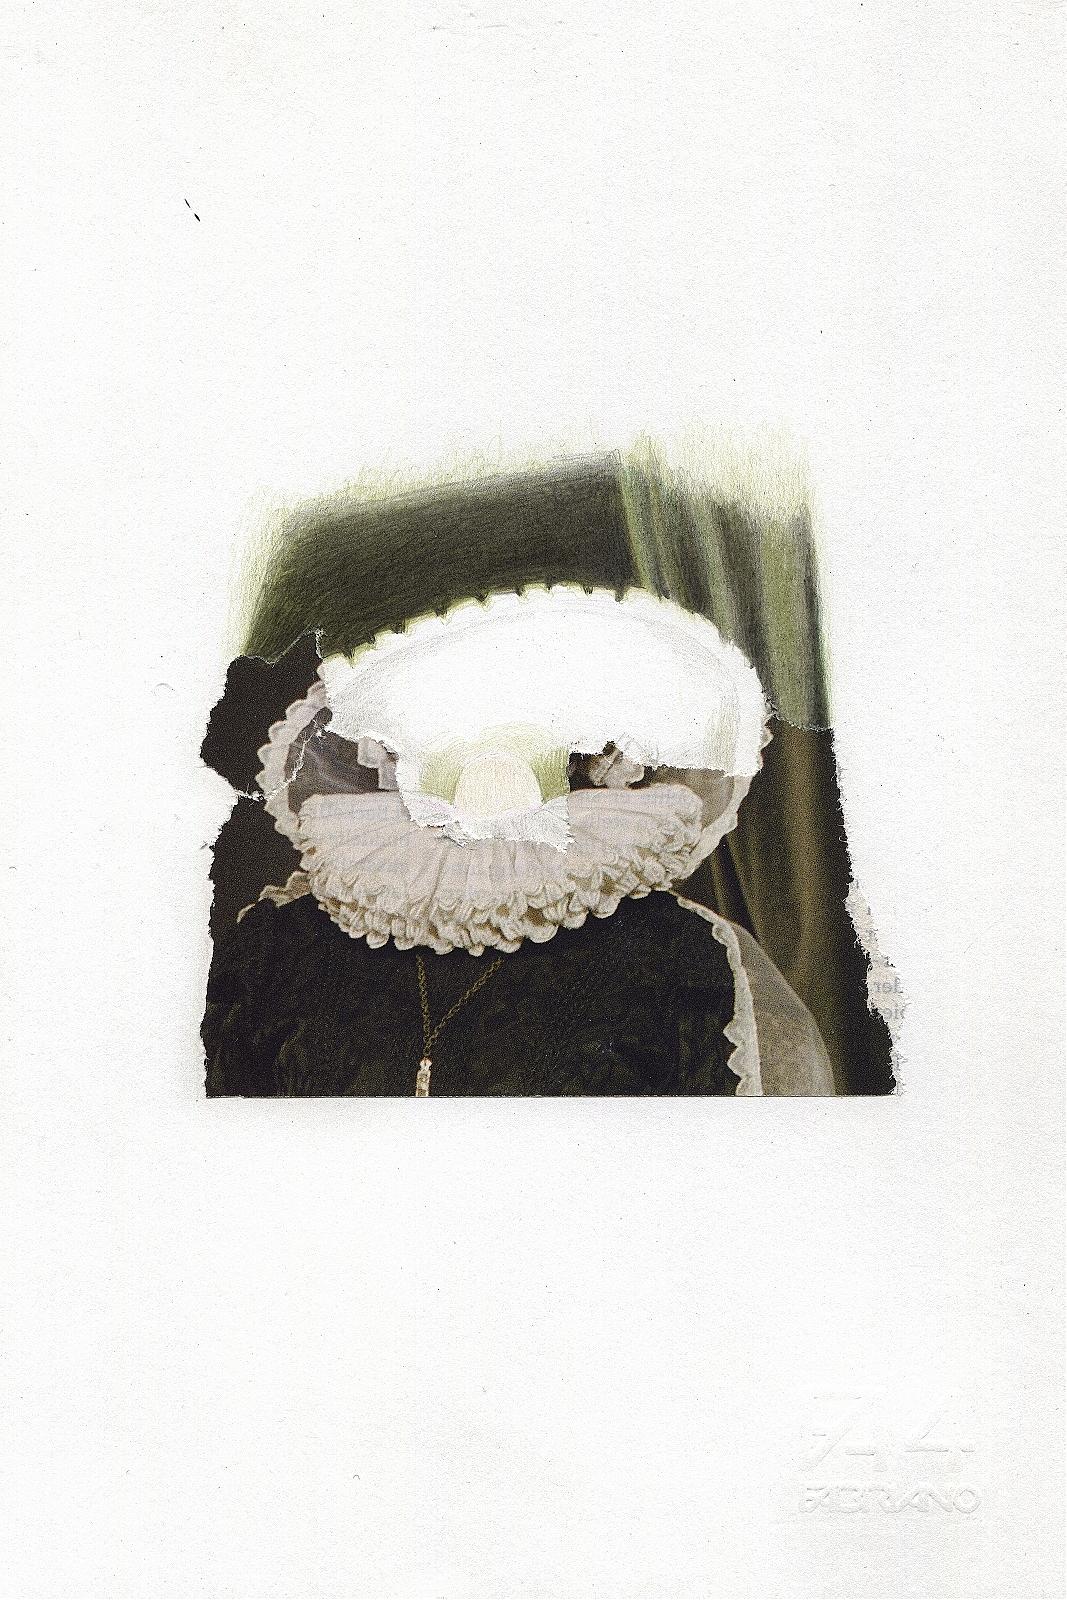 """Headless"", 2013, pencil, collage, 16.5 x 24 cm"